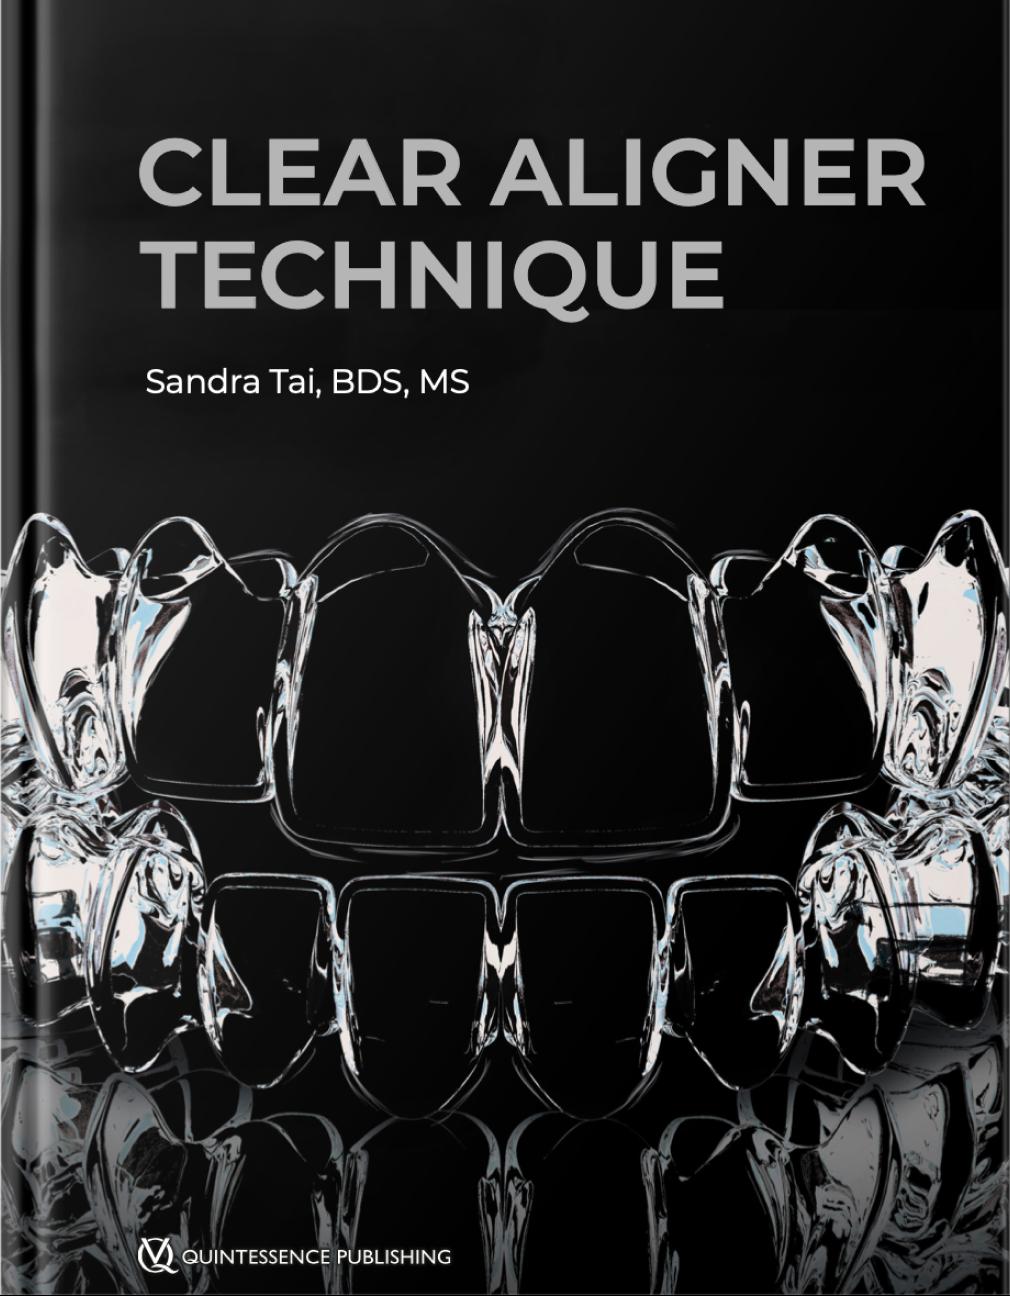 Clear Aligner Technique Book Cover